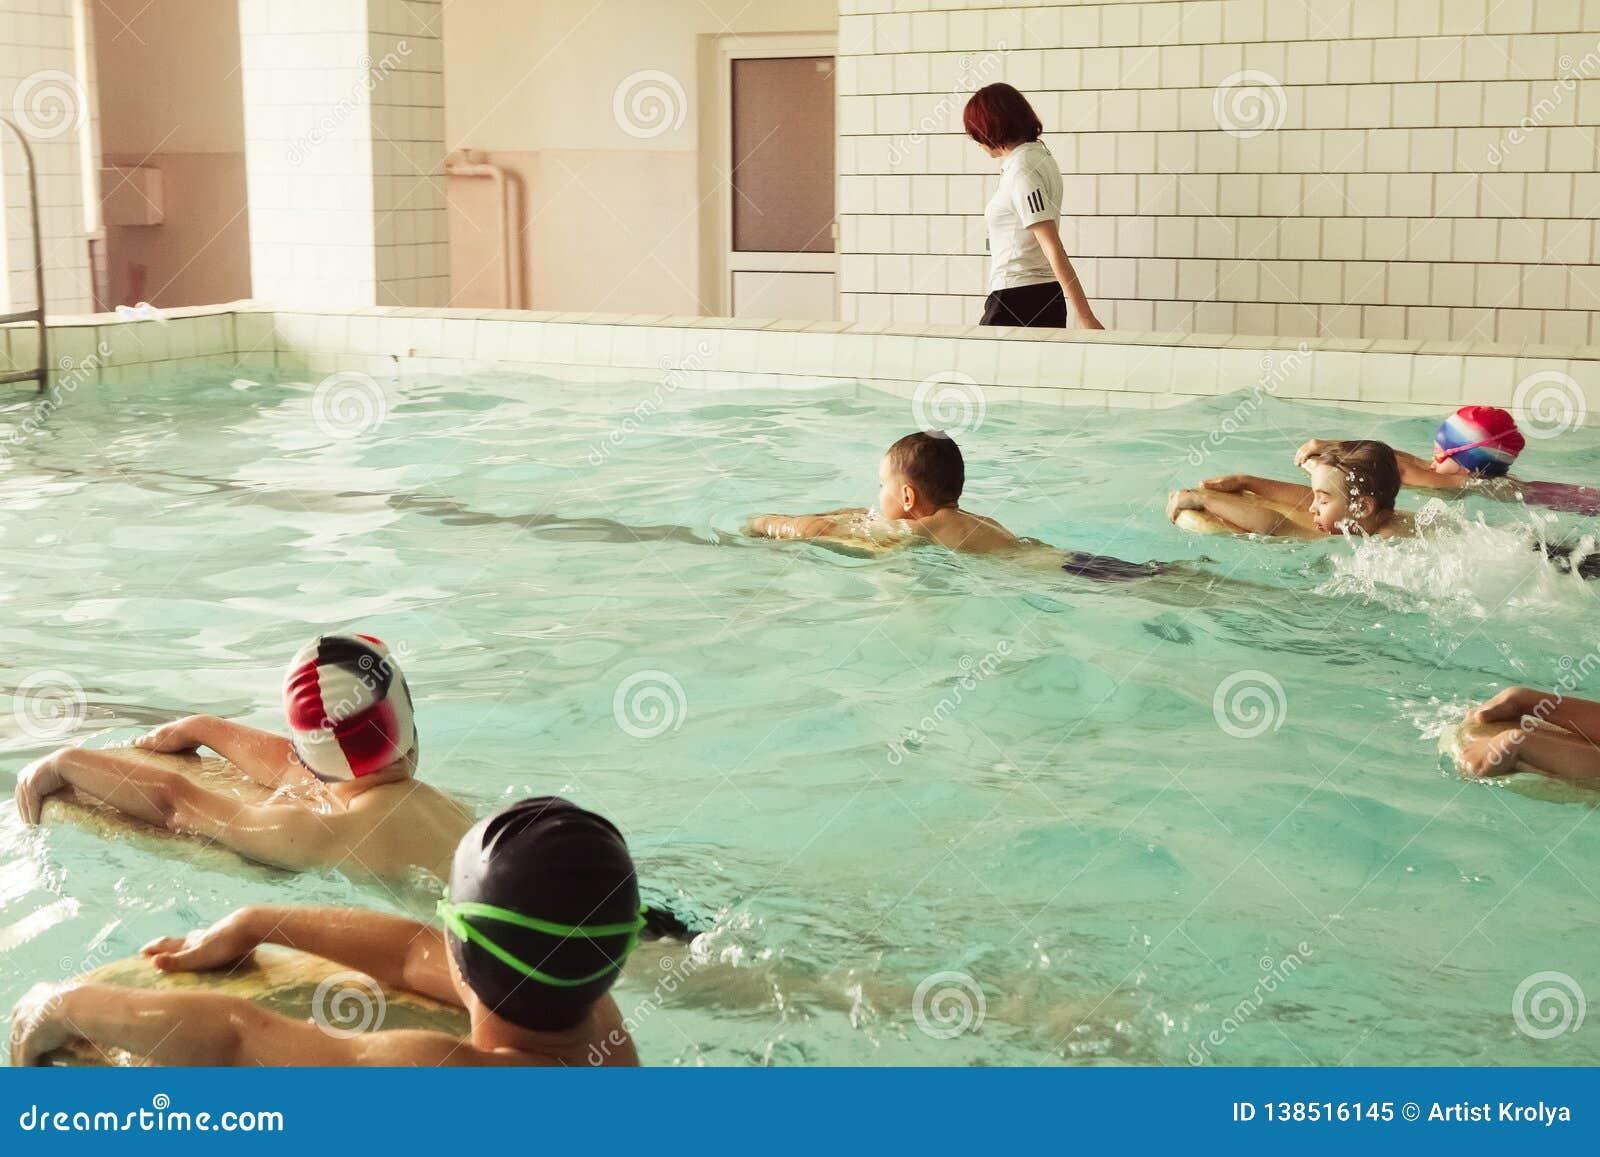 Elementary school children within swimming skills lesson.